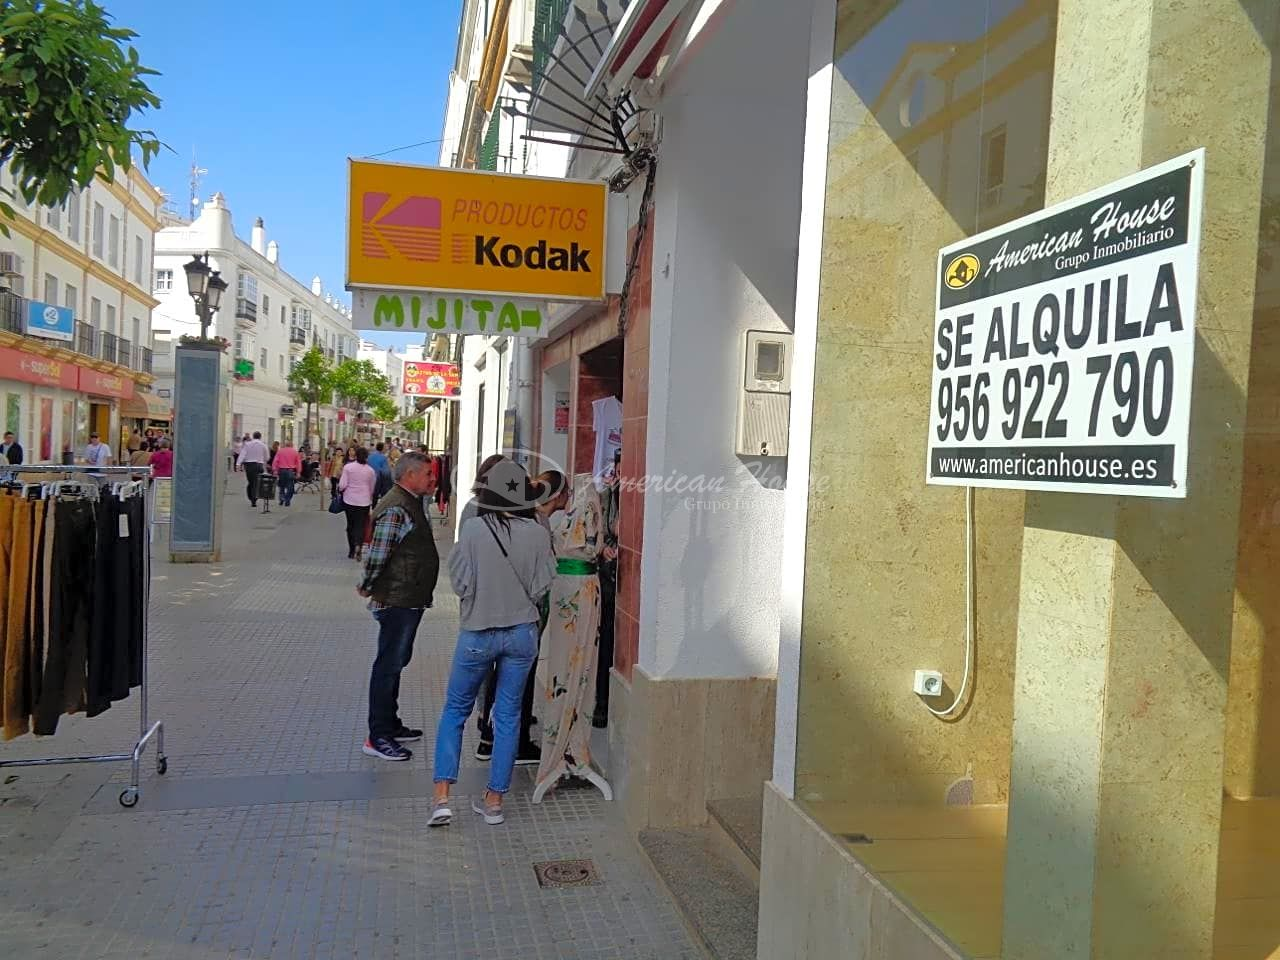 Alquiler de Local en Plena Calle La Plaza, Chiclana de la Fra., Cádiz